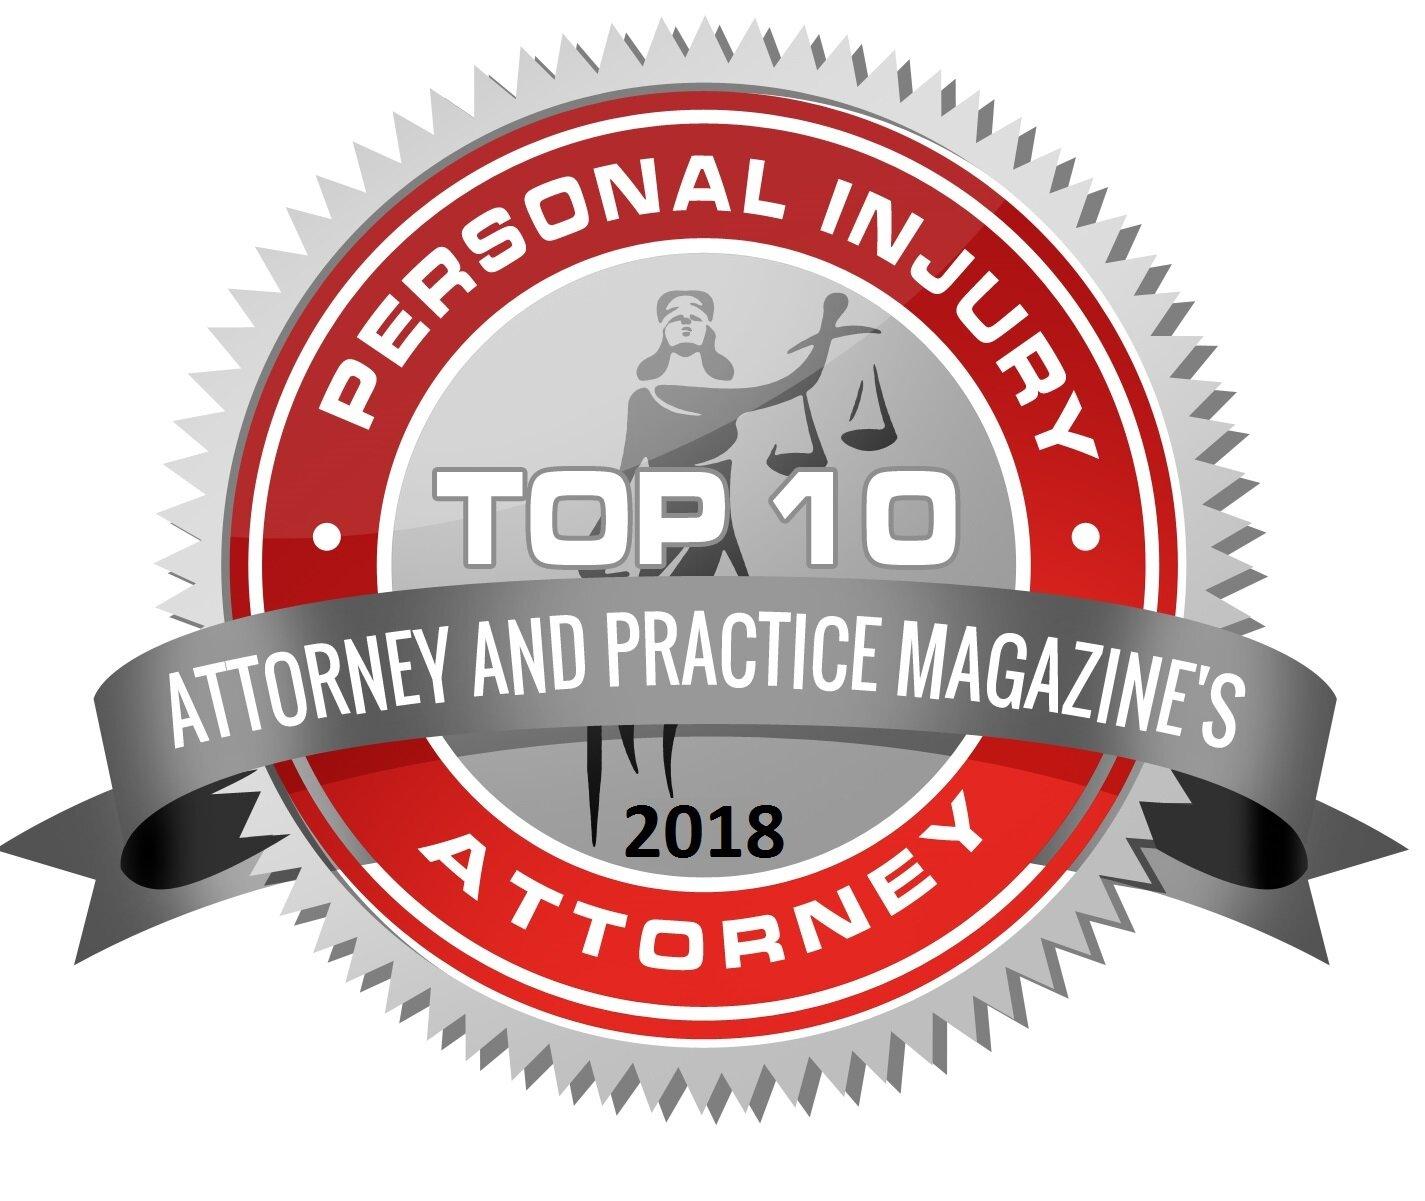 2018 Attorney_and_Practice_Magazine_badge_PERSONAL_INJURY_.jpg